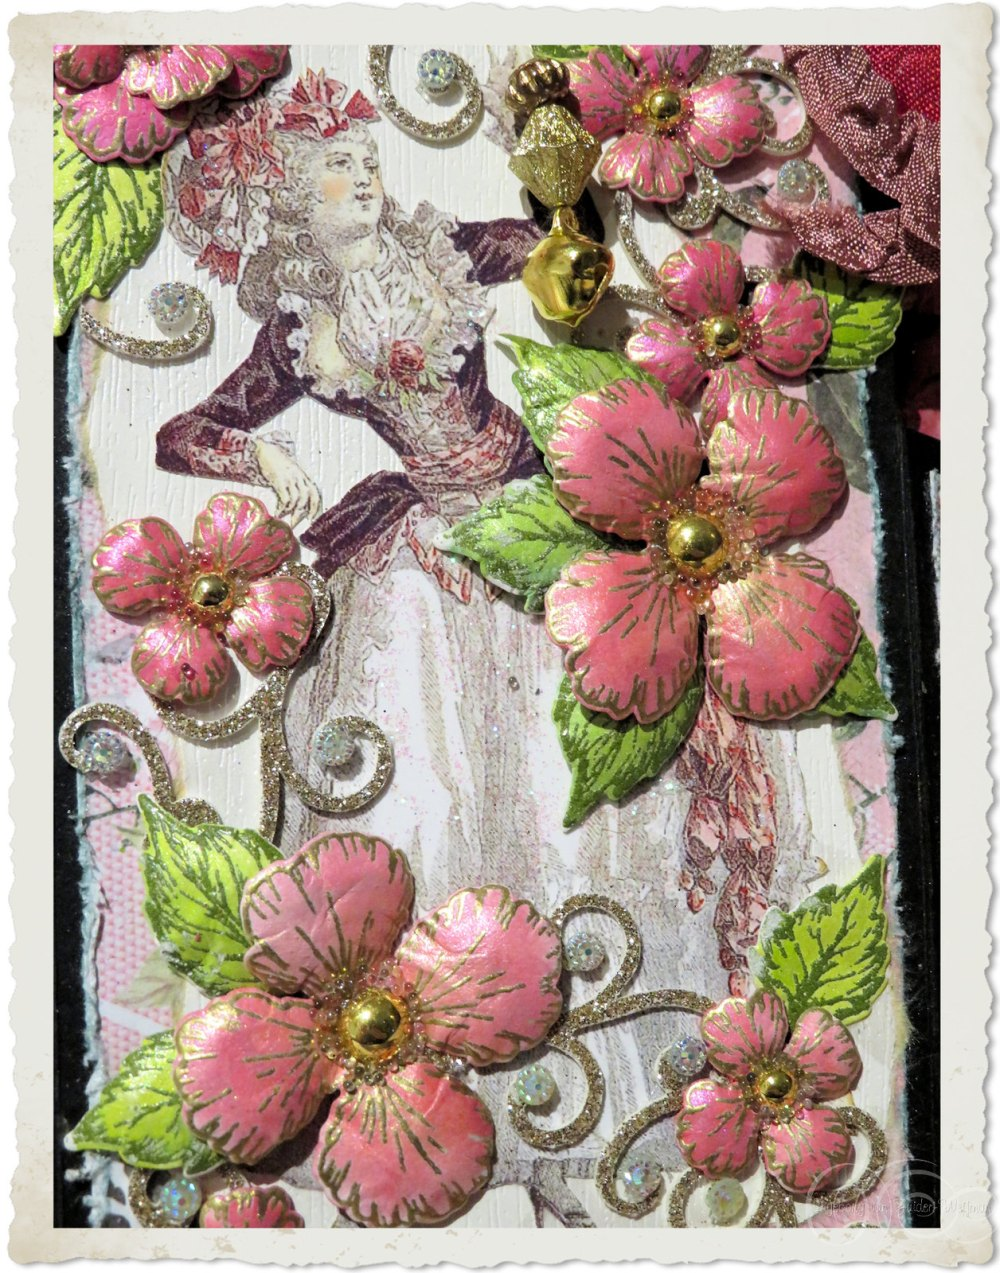 Marie-Antoinette with Oakberry Lane flowers from Heartfelt Creations